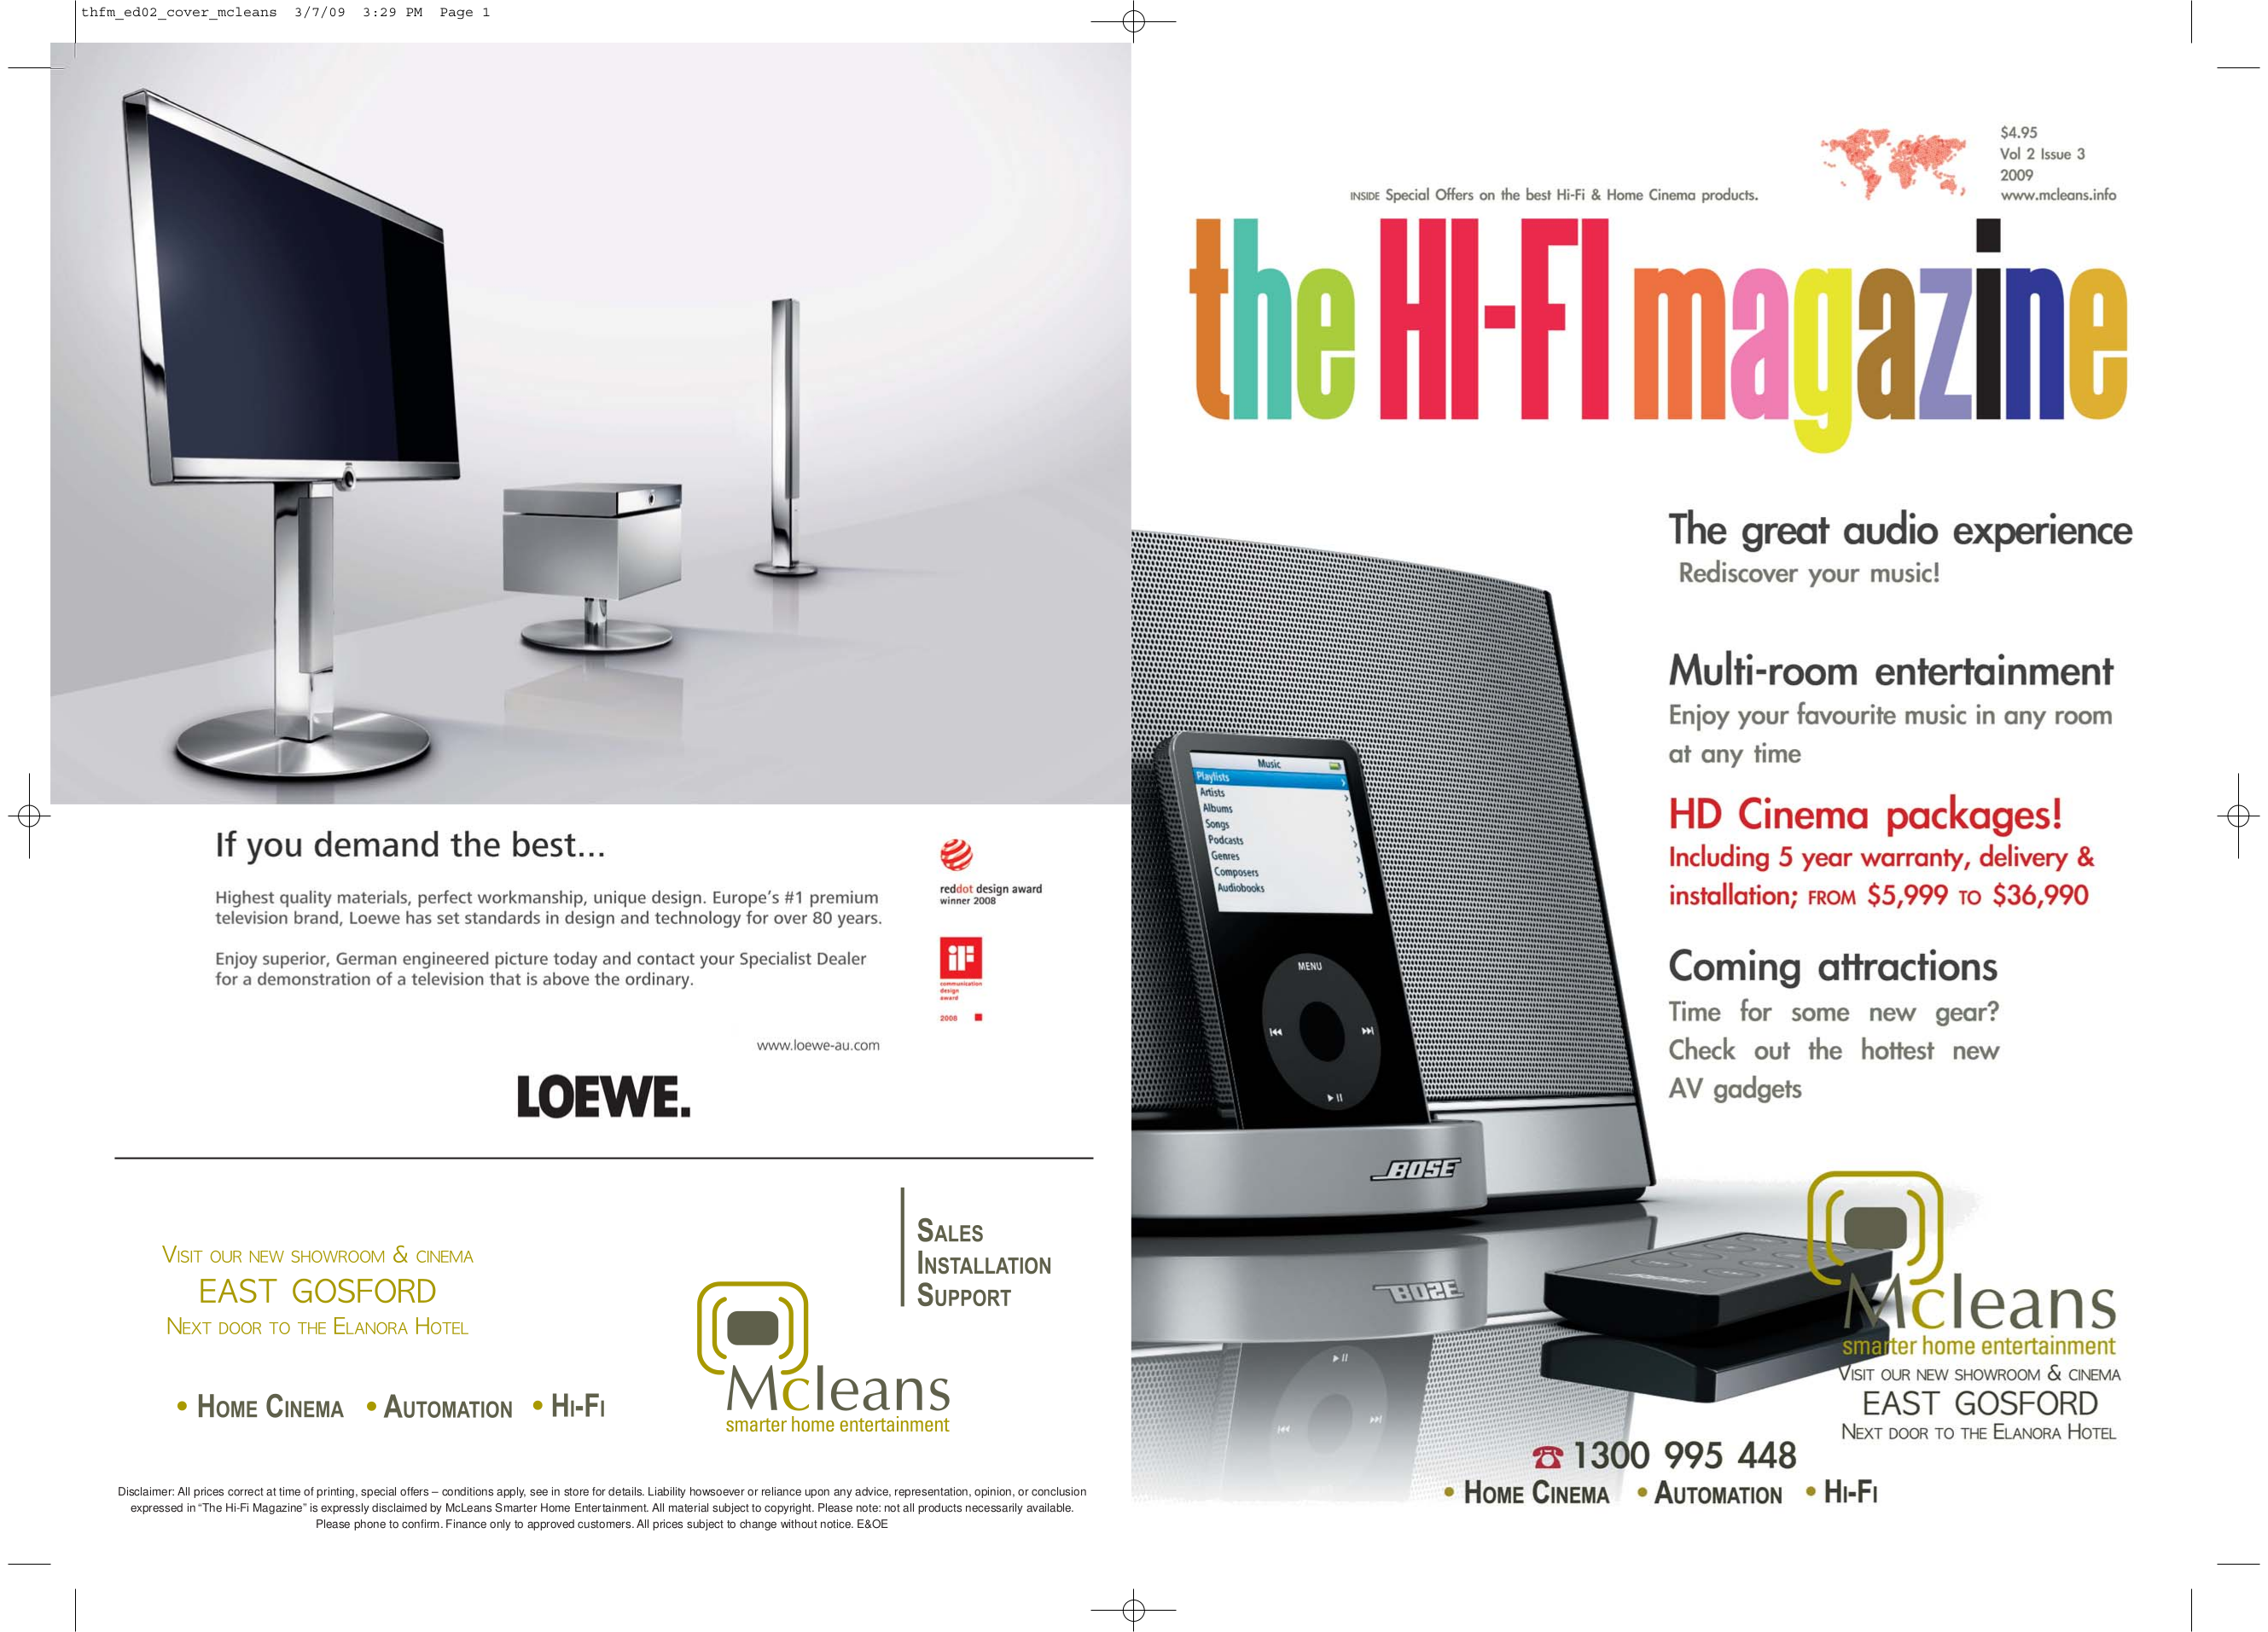 pdf for Niles Speaker CM730DSFX manual